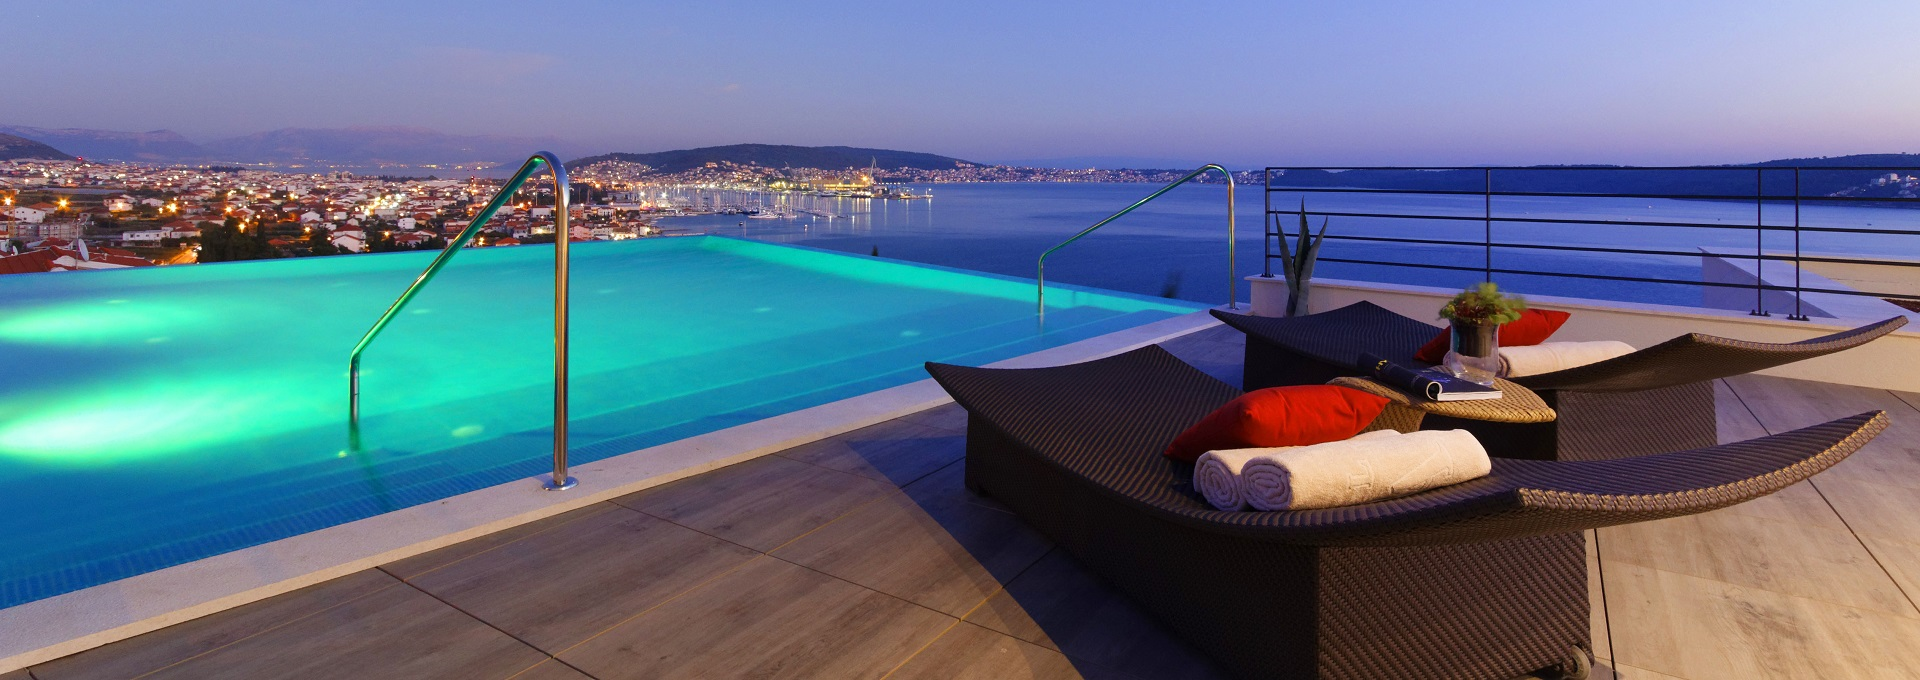 hotel-ola-rooftop-pool-night